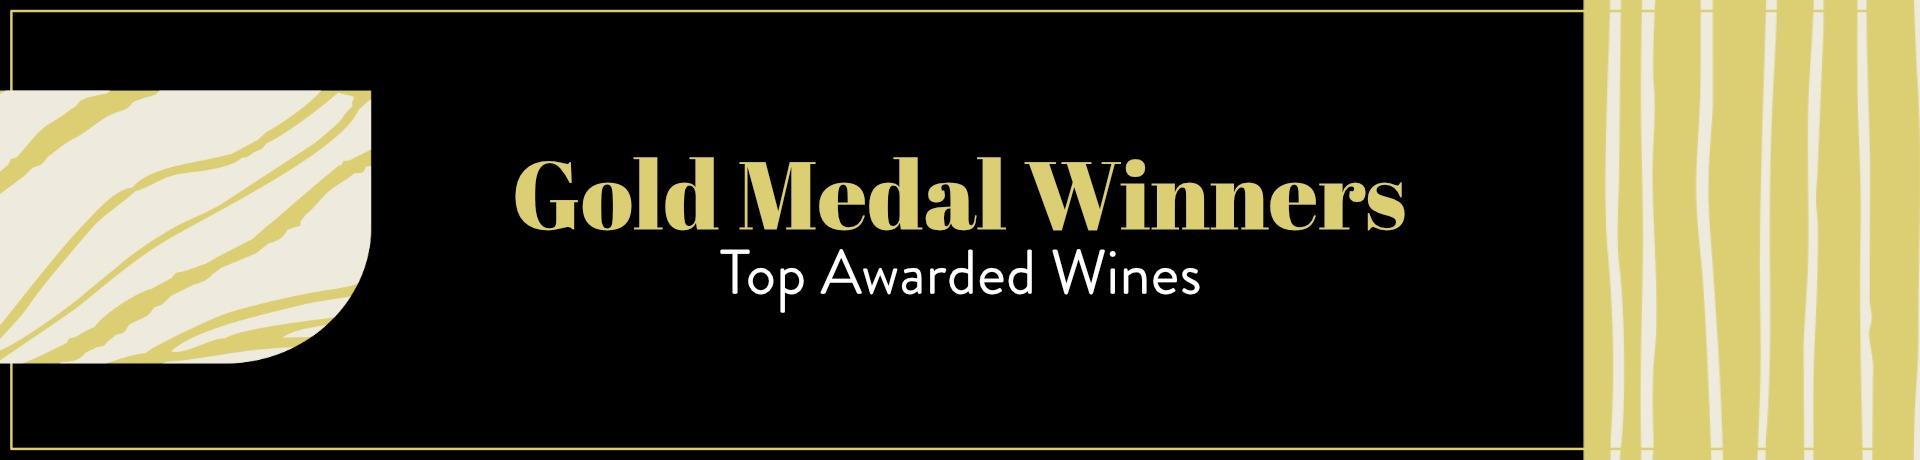 Gold Medal Winning Wines